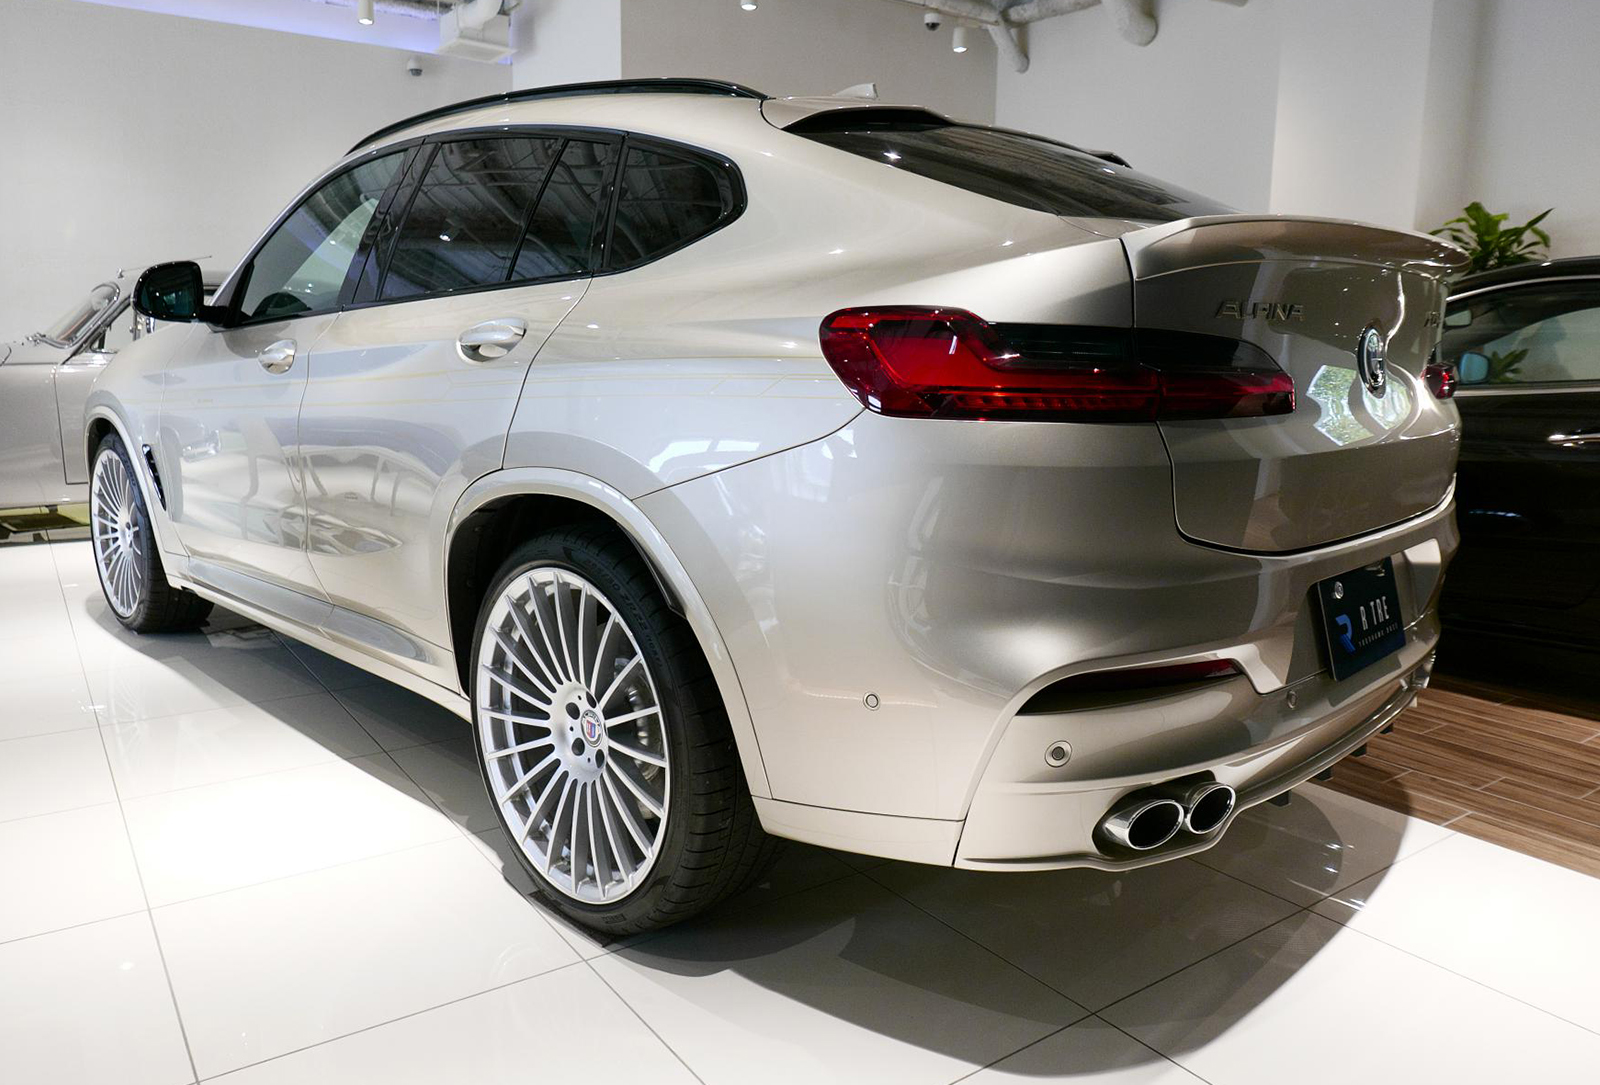 BMW アルピナ XD4 Allrad 左リア